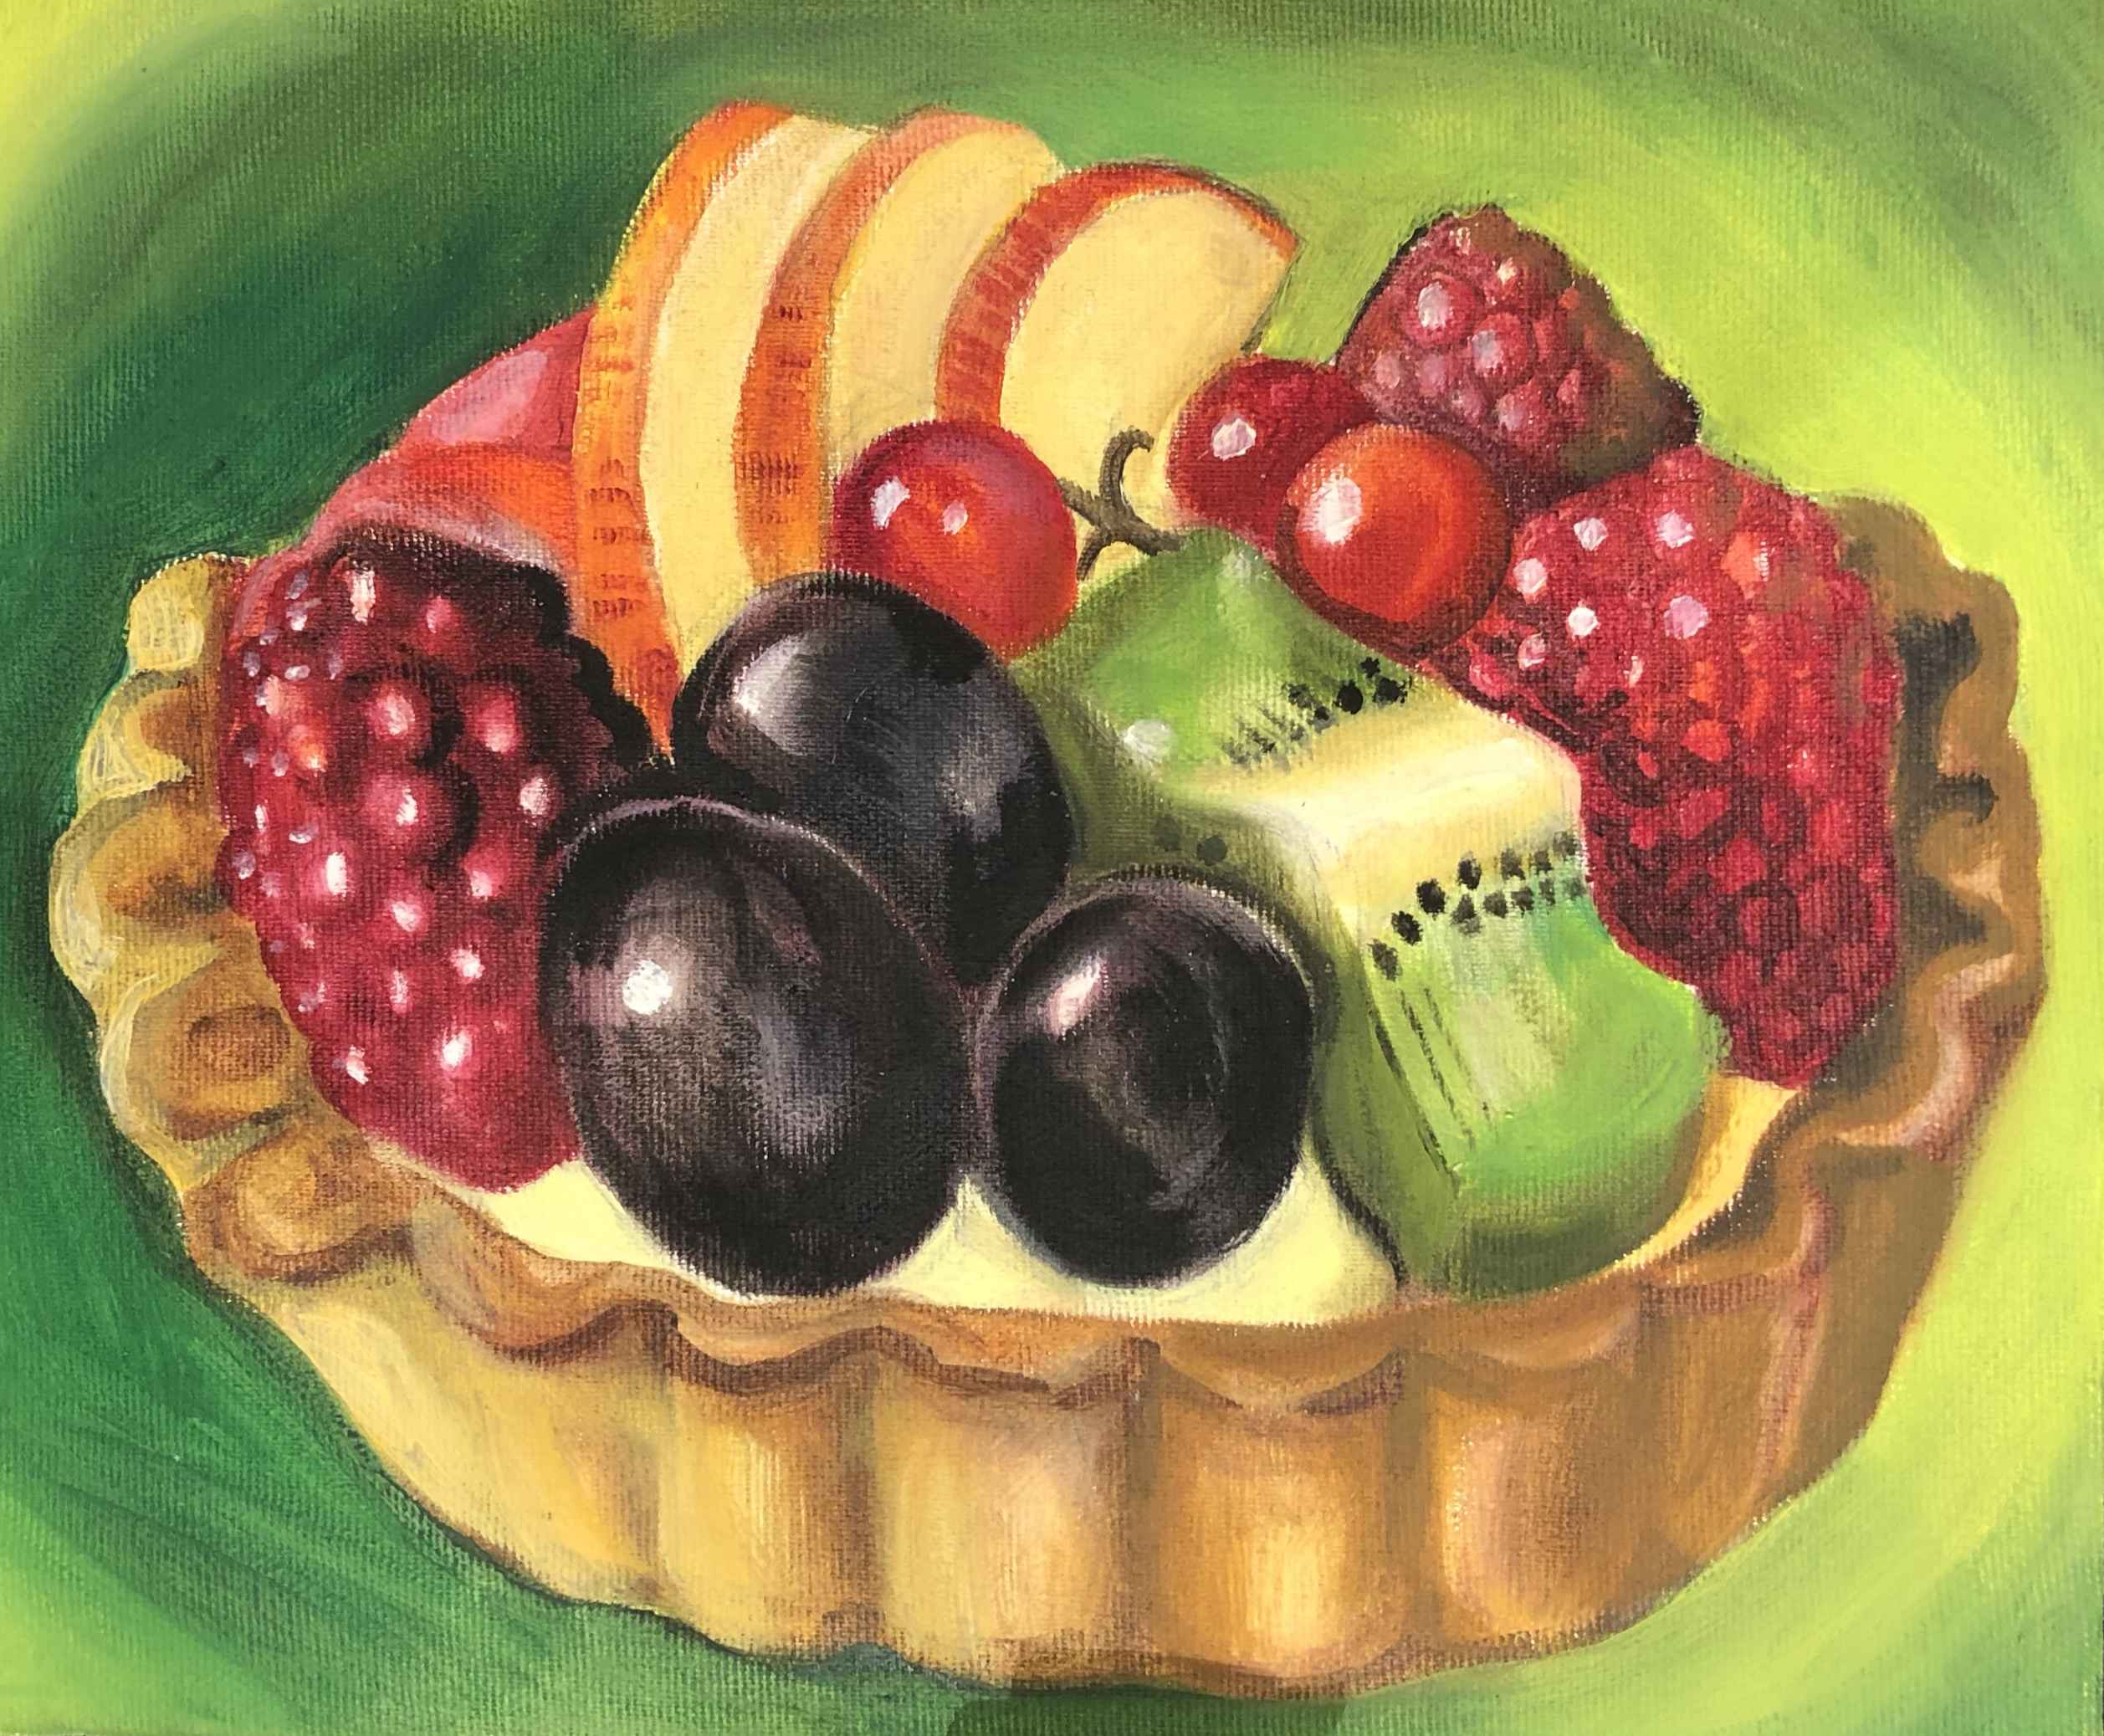 Tarte aux Fruits III by Ms. Rebecca Vincenzi - Masterpiece Online